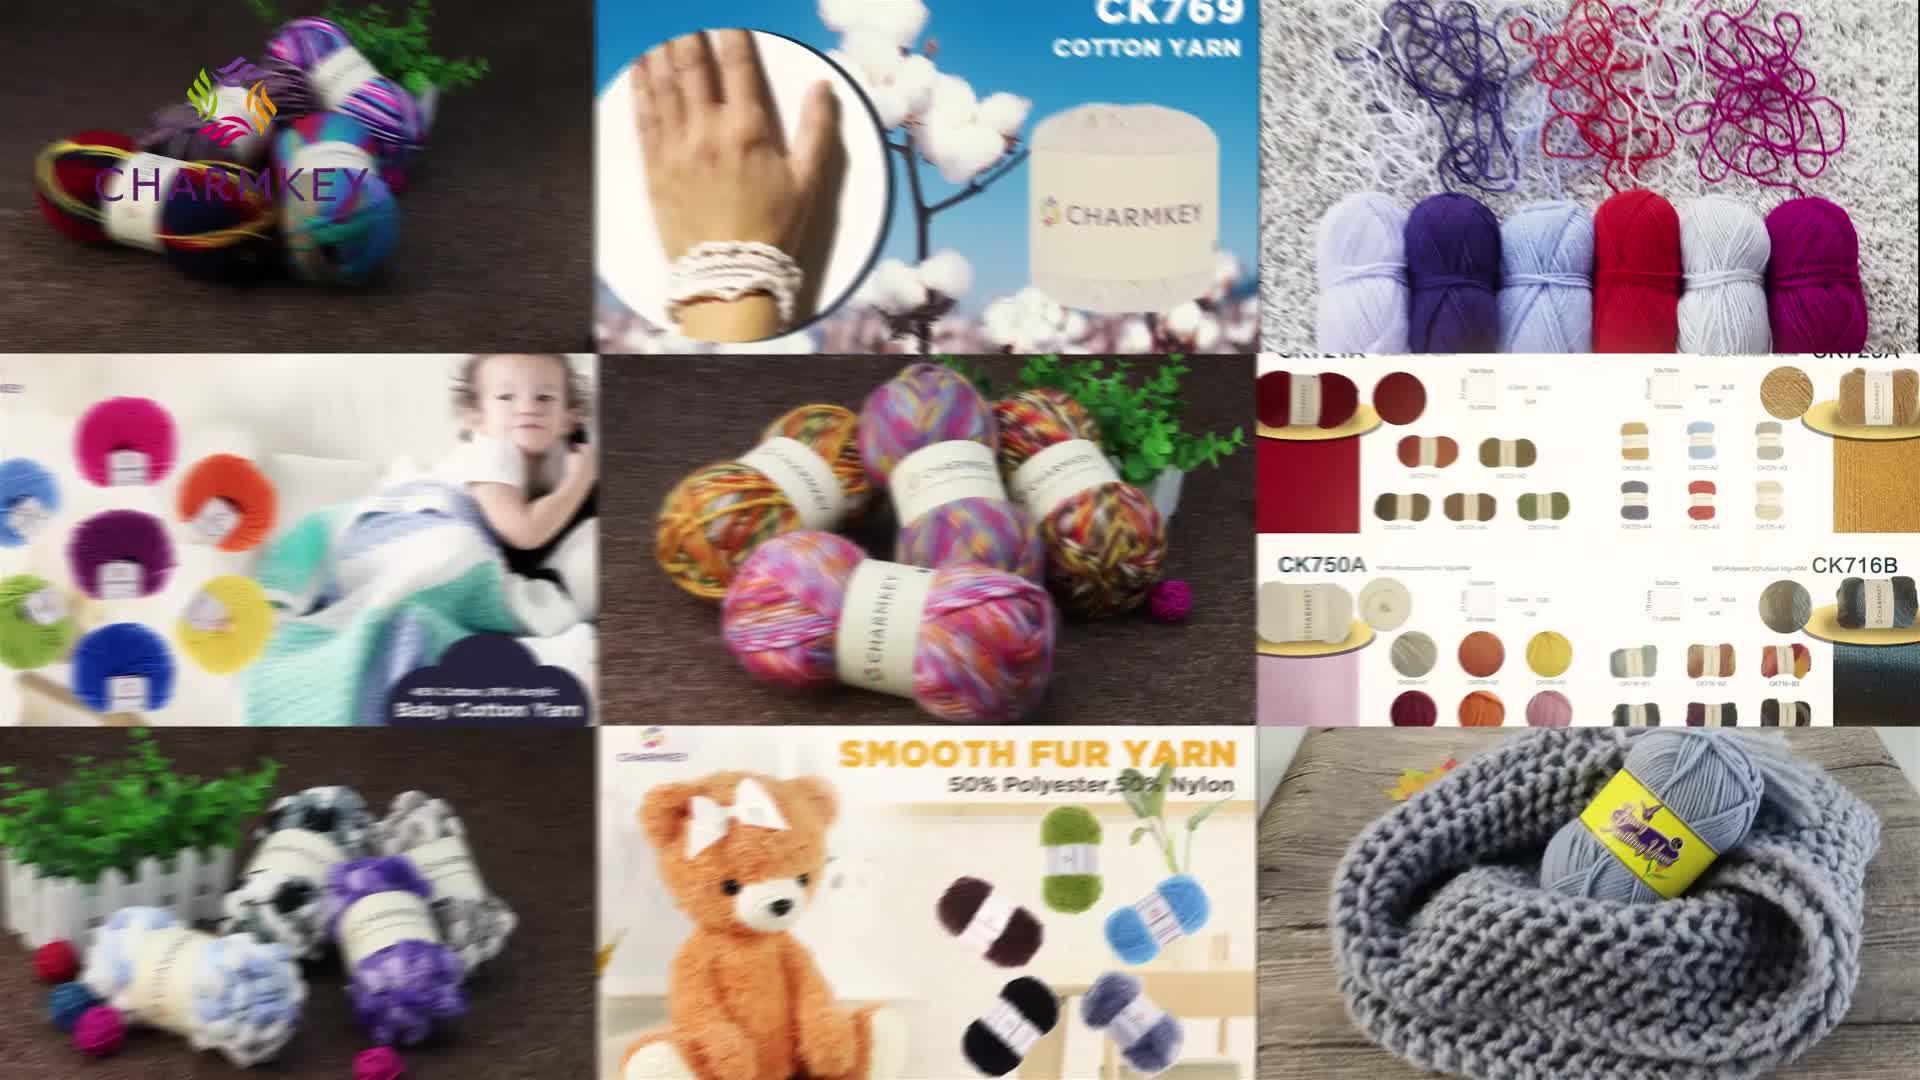 China Wholesales Charmkey 100% Nylon Mohair Yarn Hand Knitting Yarn for Sweater and Scarf